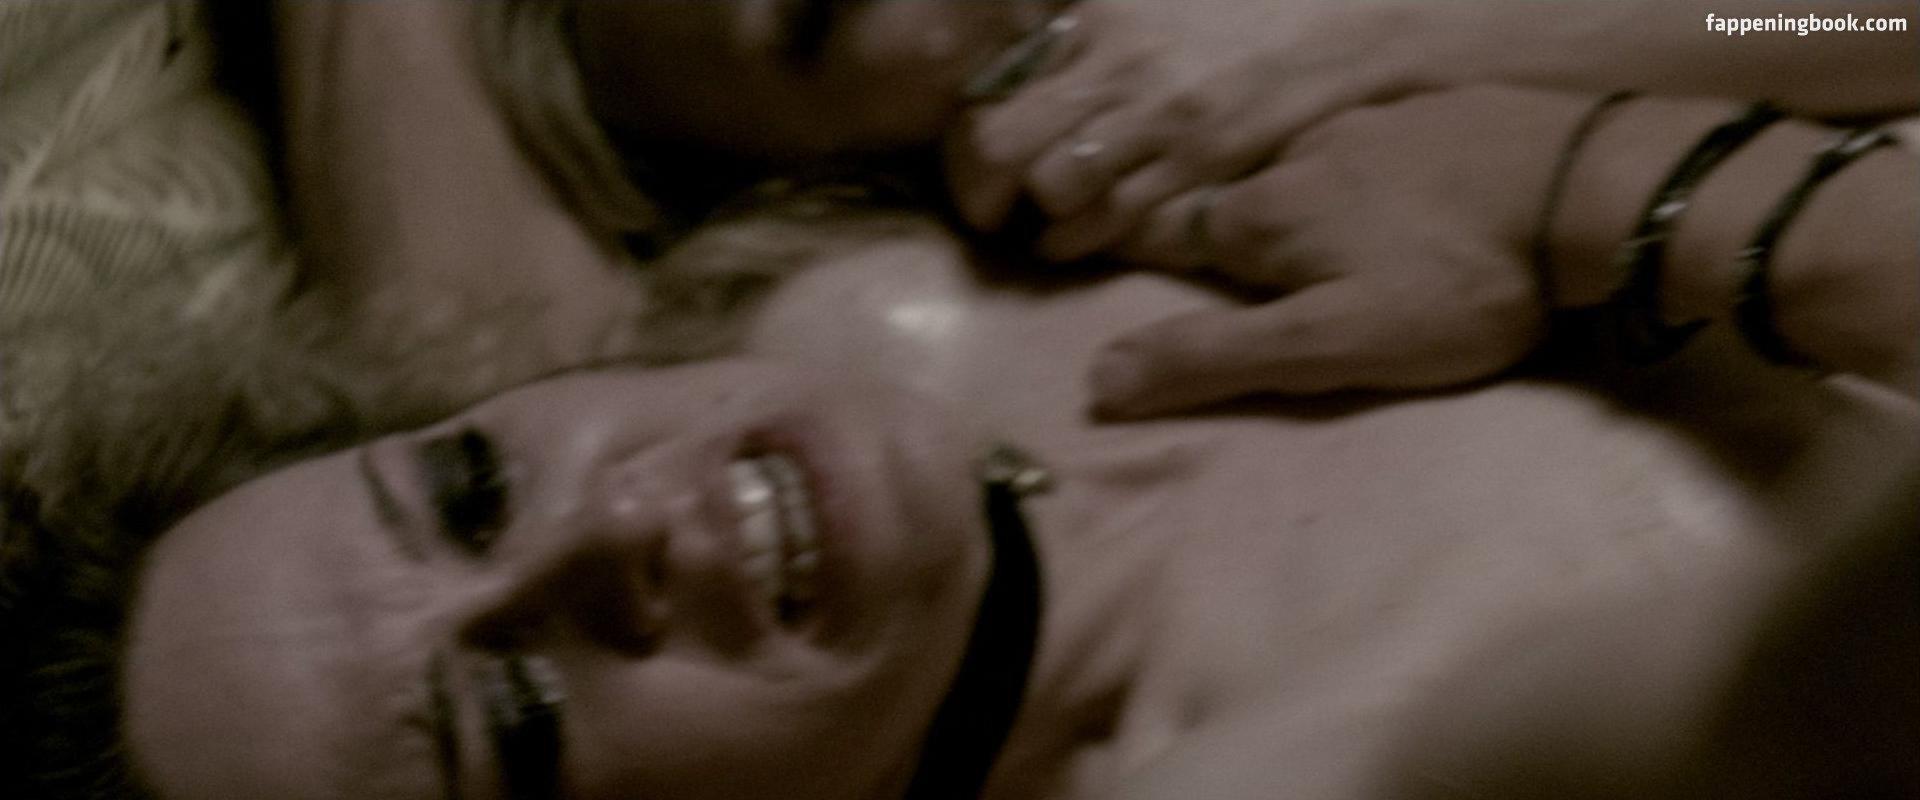 Deadwood nude pics, page